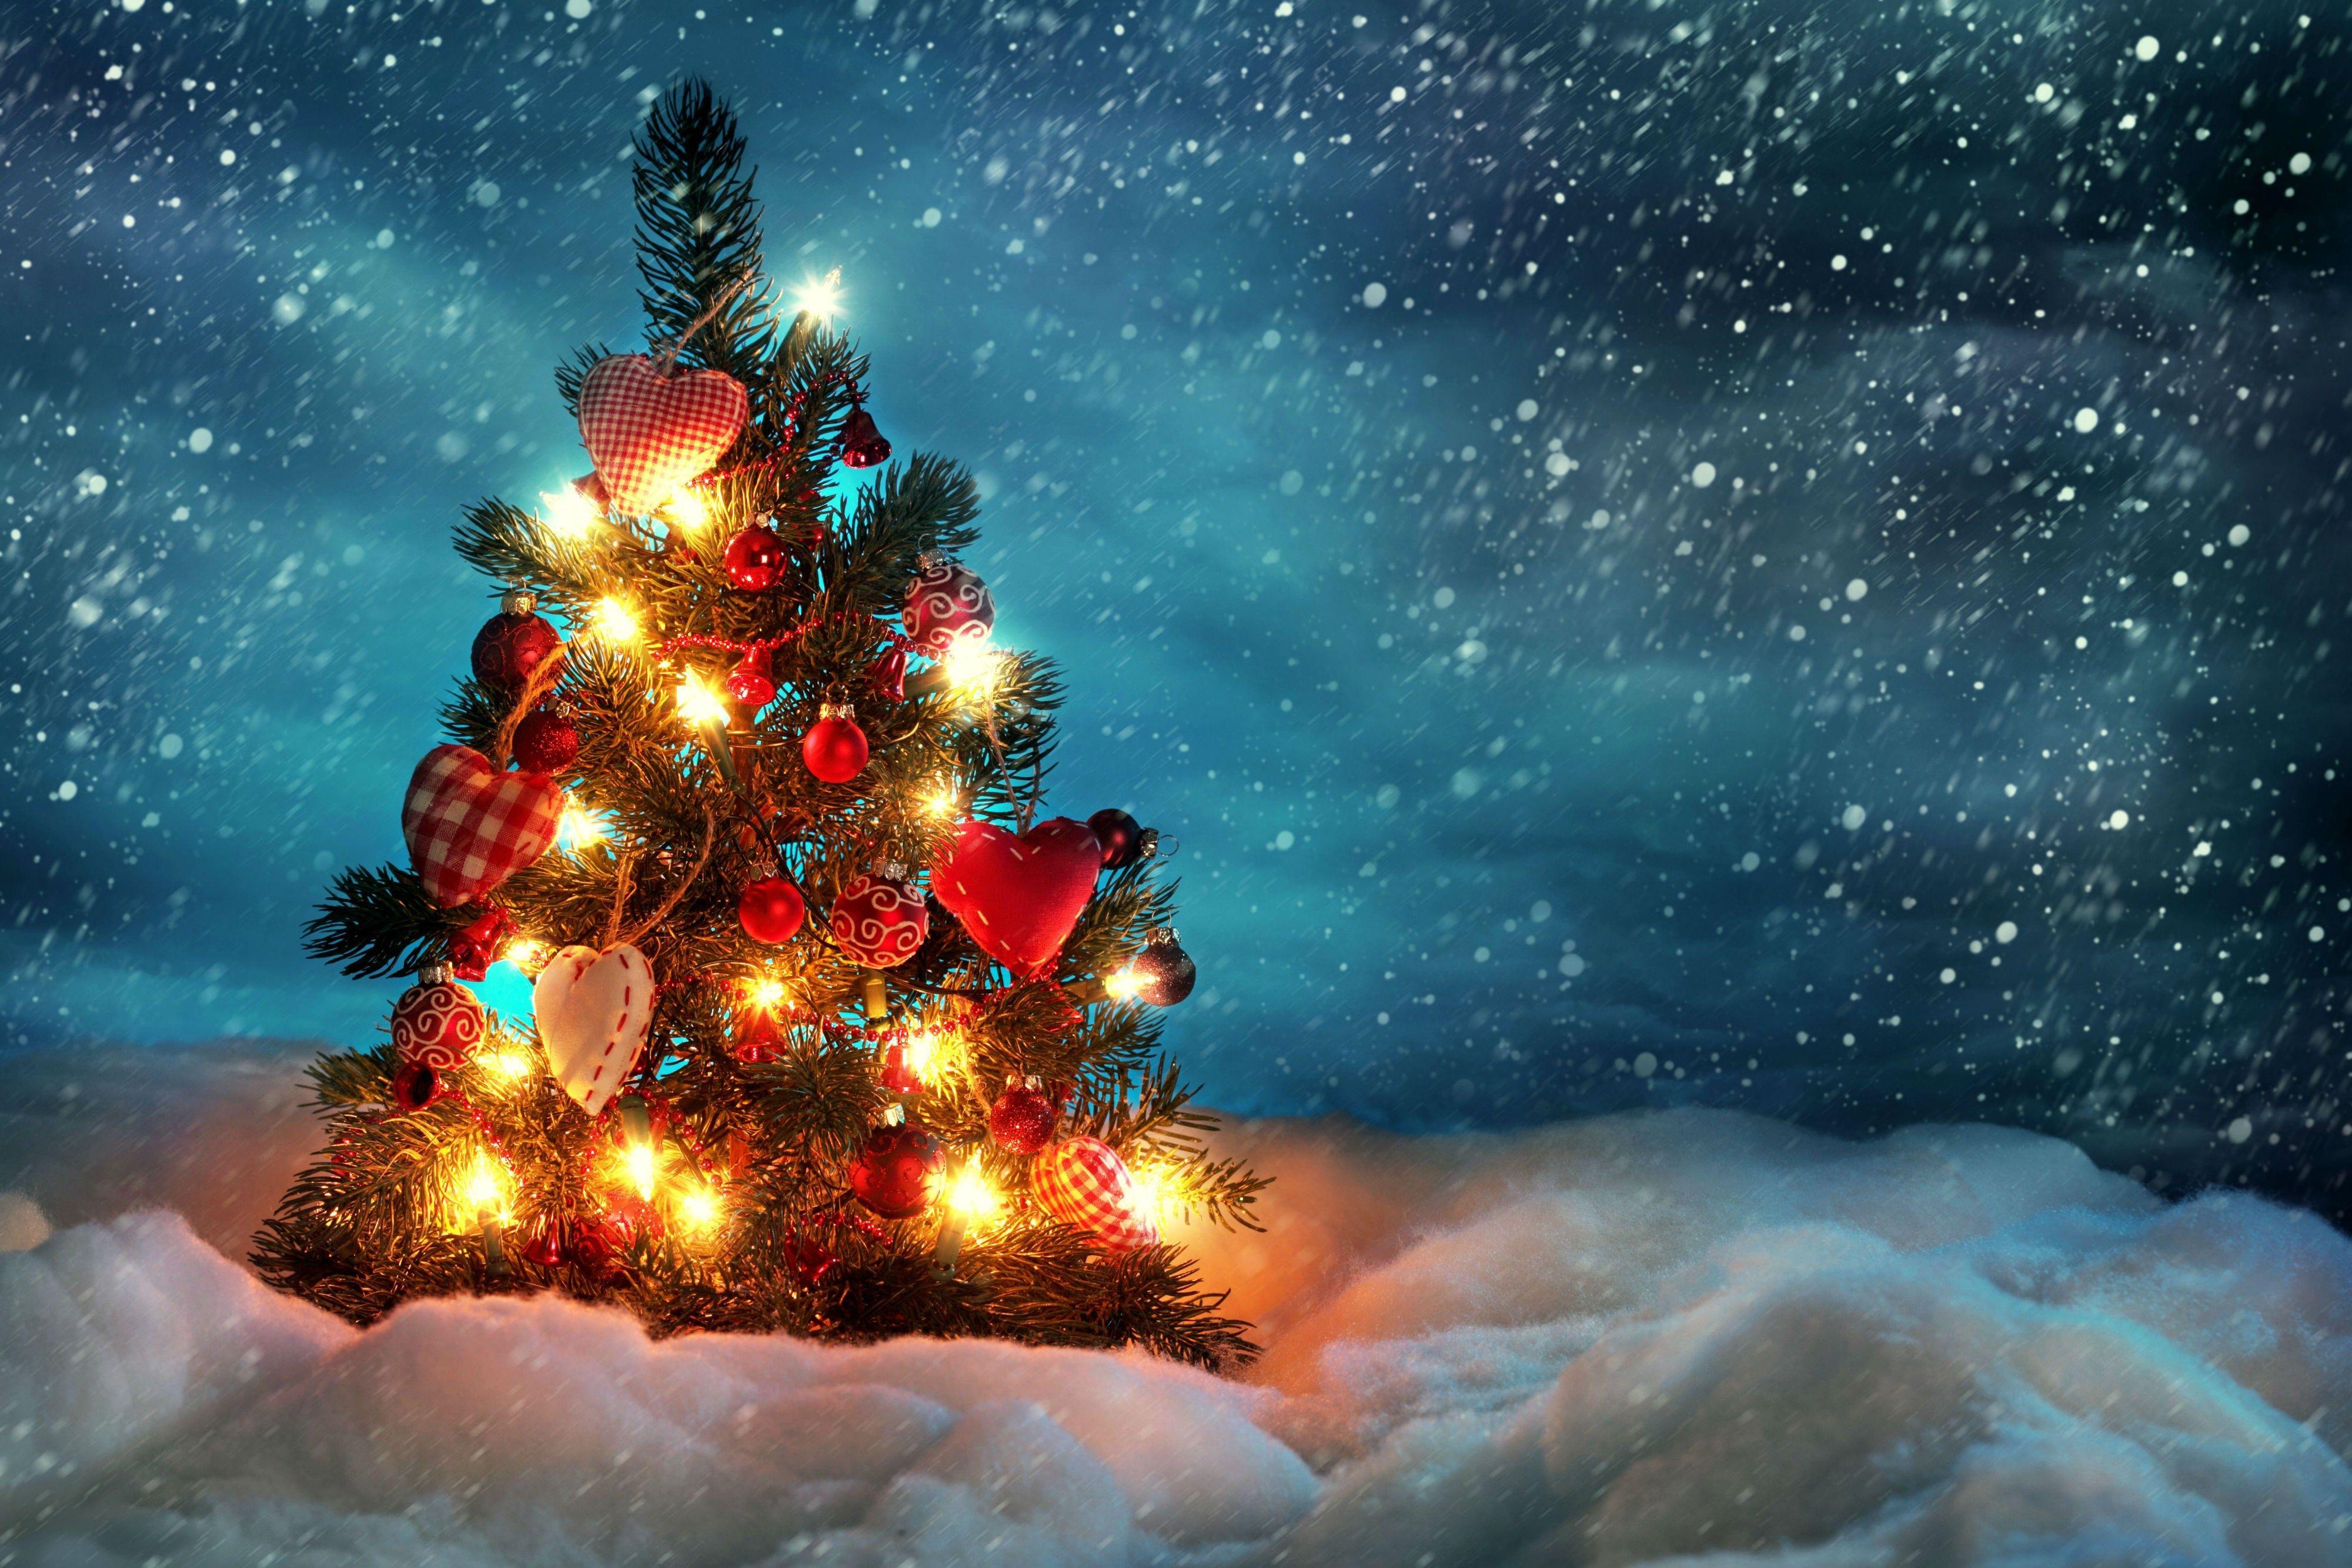 Free High Resolution Wallpaper Christmas 4000x2667 1564 Kb